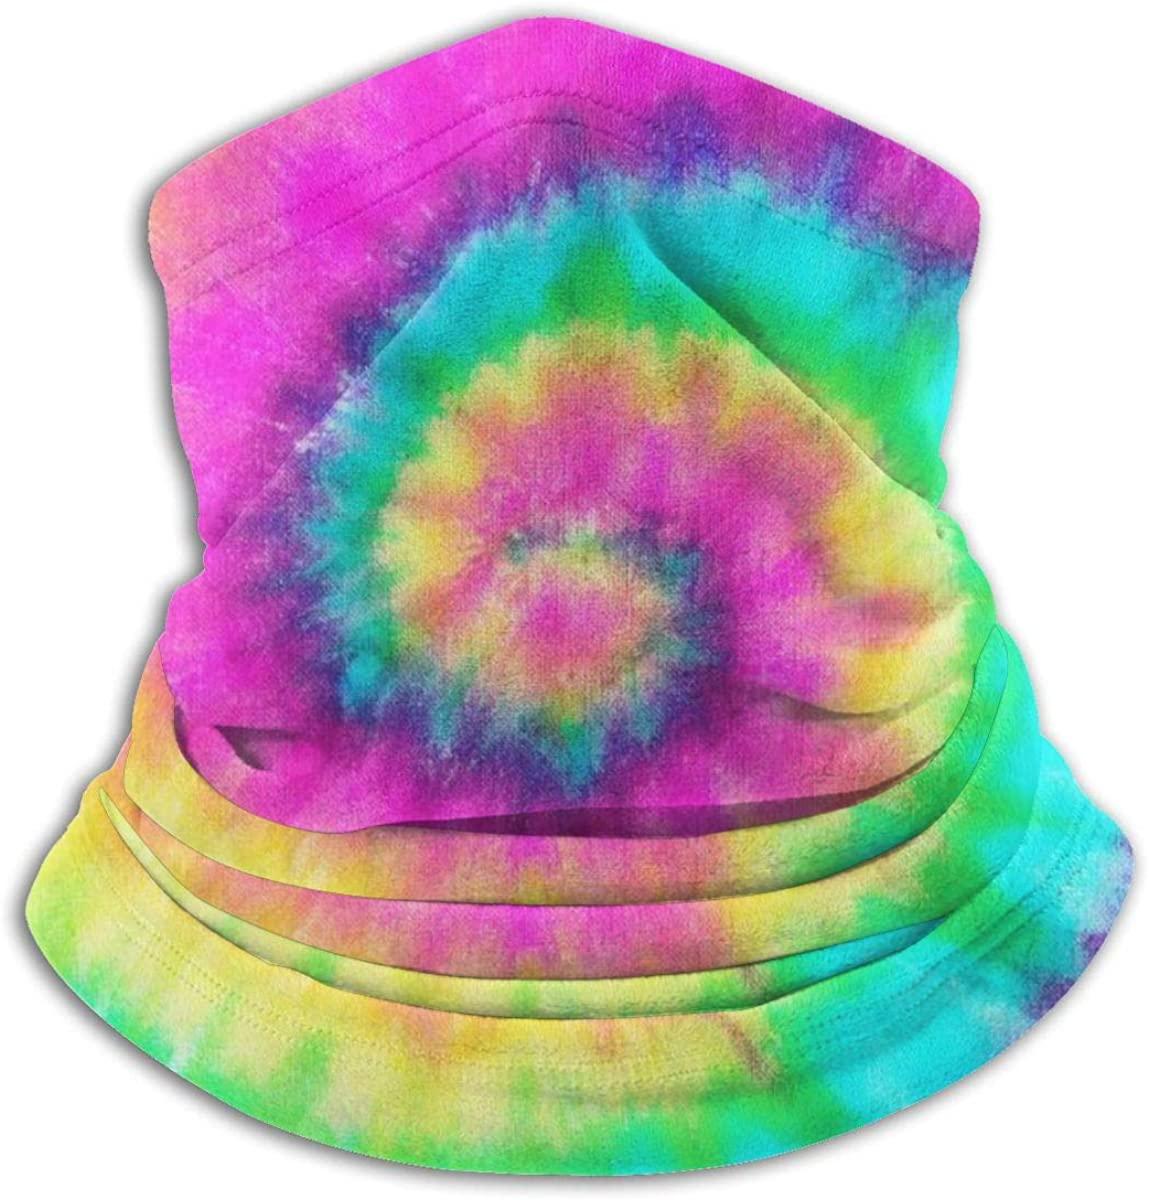 MSGUIDE Face Shields Multipurpose Elastic Neck Gaiter UV Balaclava for Men and Women